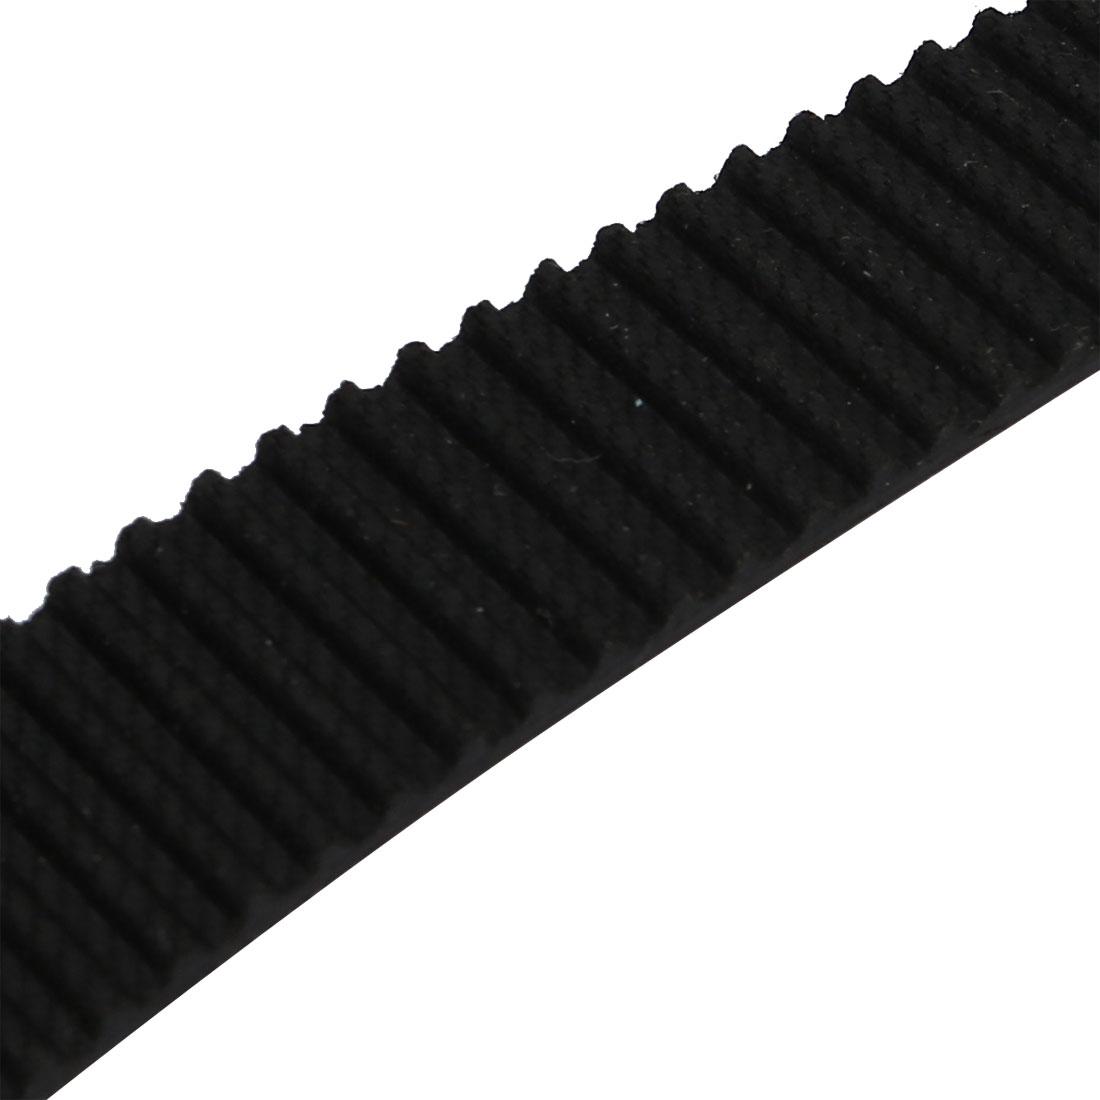 S3M 119 Teeth Engine Timing Belt Rubber Geared-Belt 357mm Girth 15mm Width - image 1 de 2